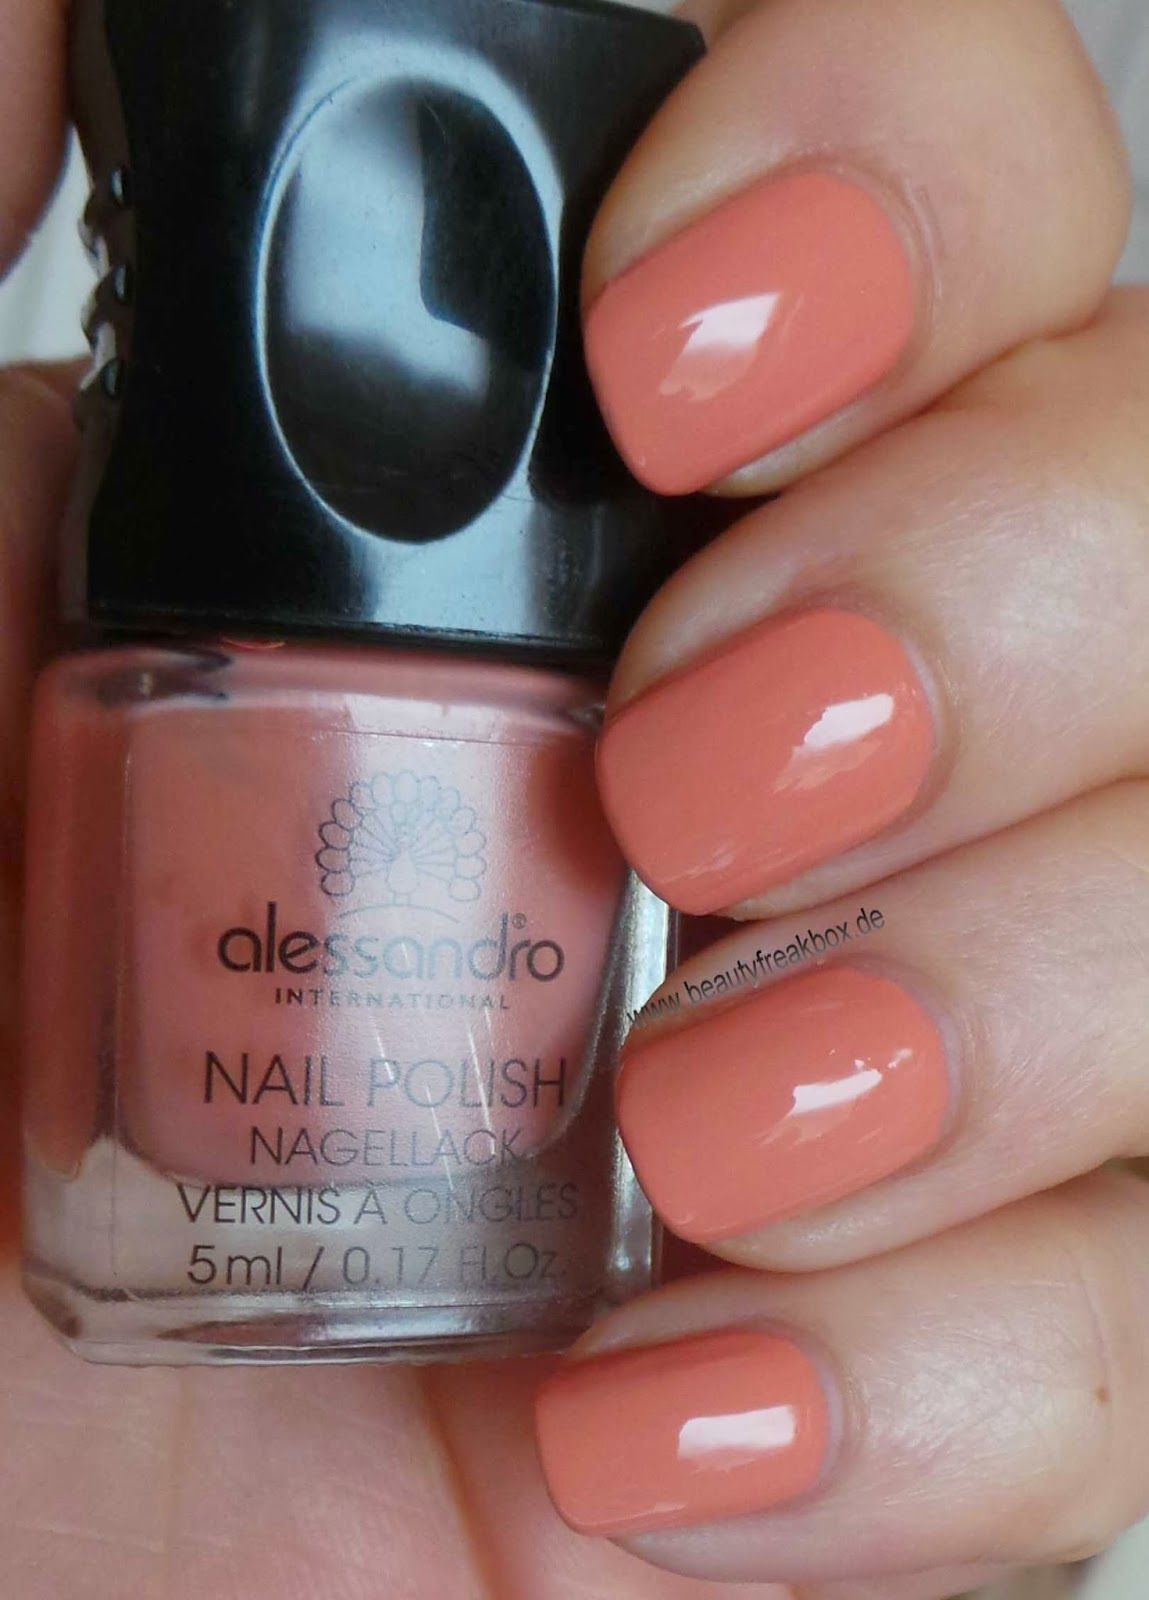 alessandro Sunday Rose Nagellack - Apricot Touch | Feeling So ...